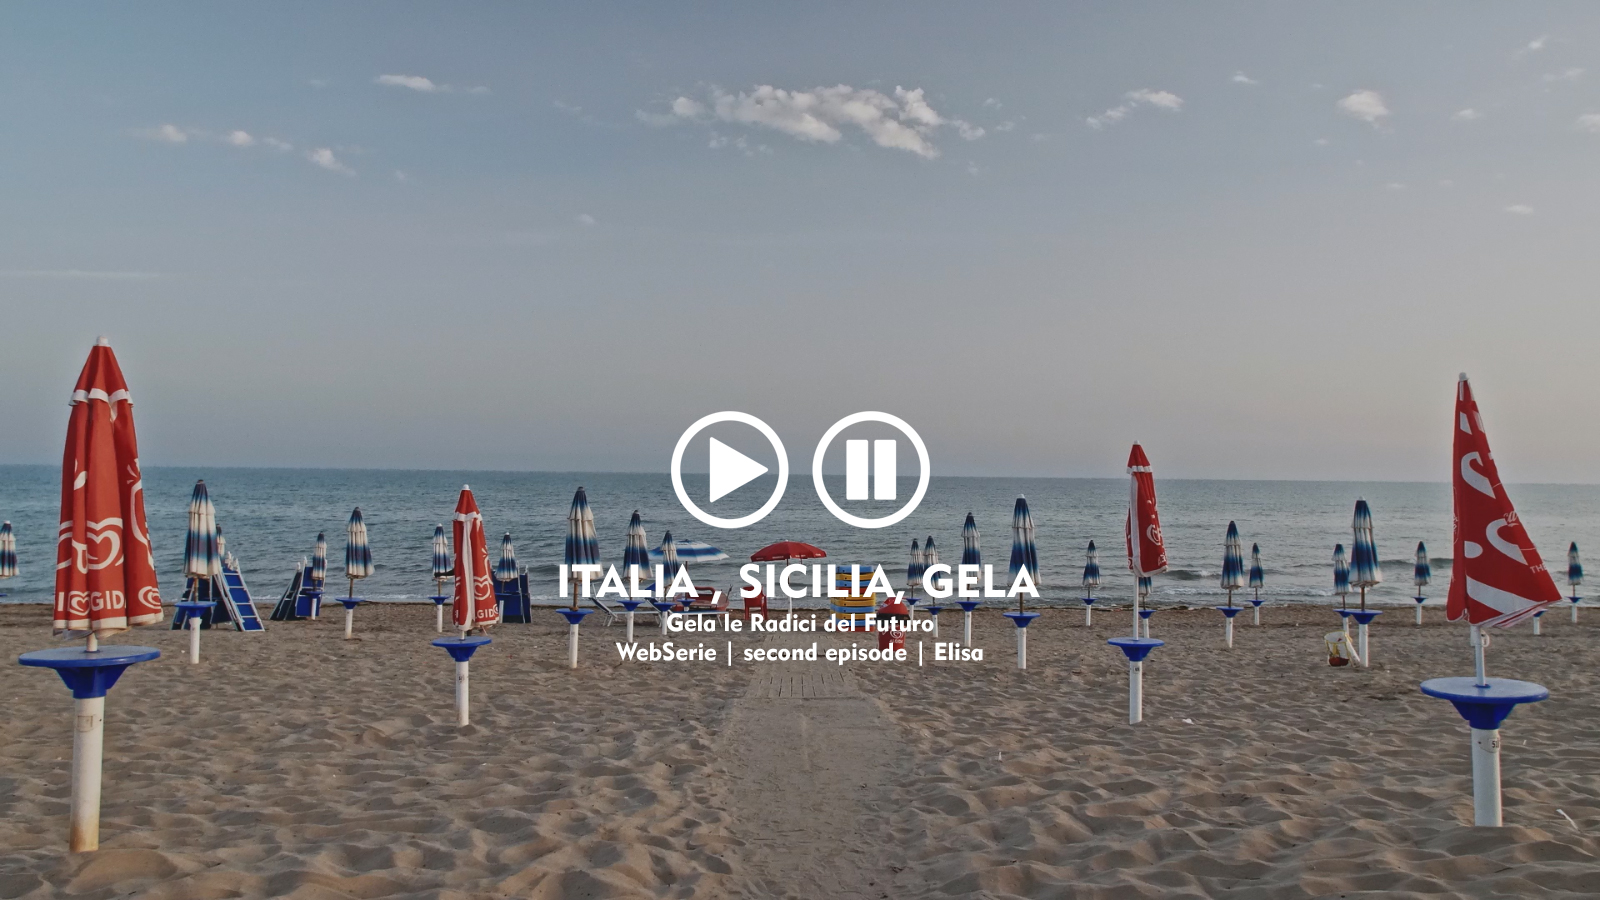 webserie | italia, sicilia, gela | second episode | elisa